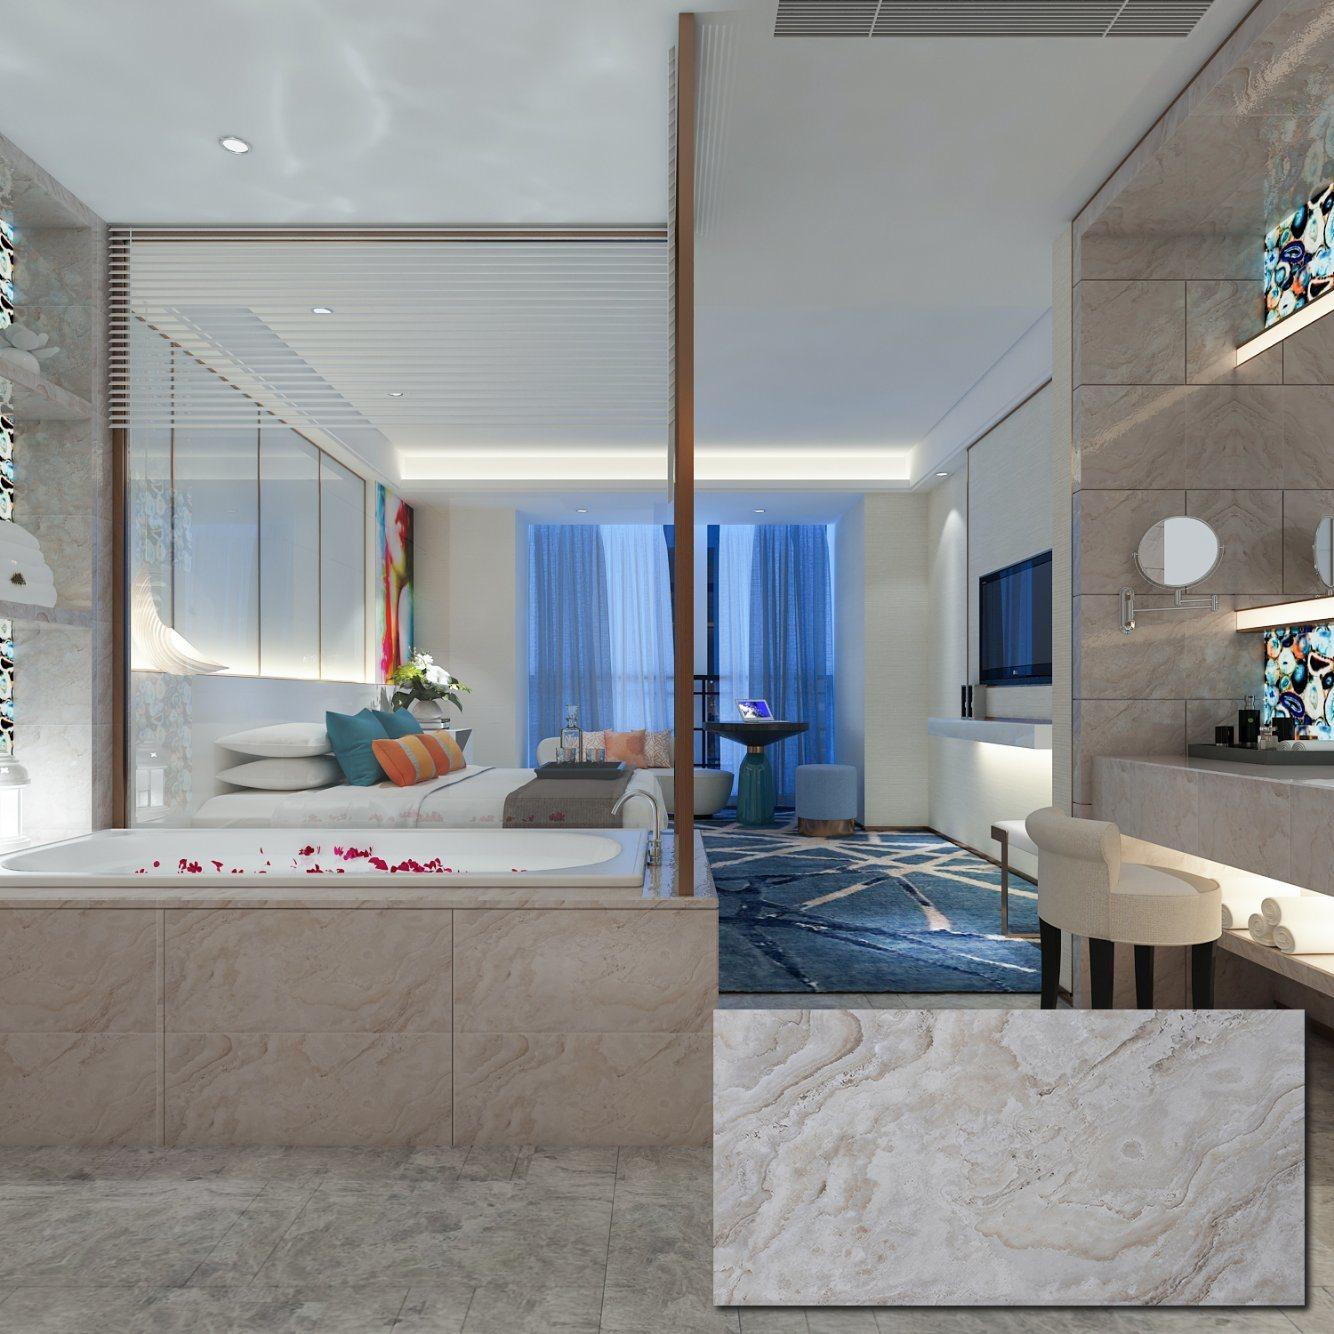 China Saltillo Small Bathroom Grey Marble Texture Standard Wall Tile Dimensions China Bathroom Tile Lanka Tile Price